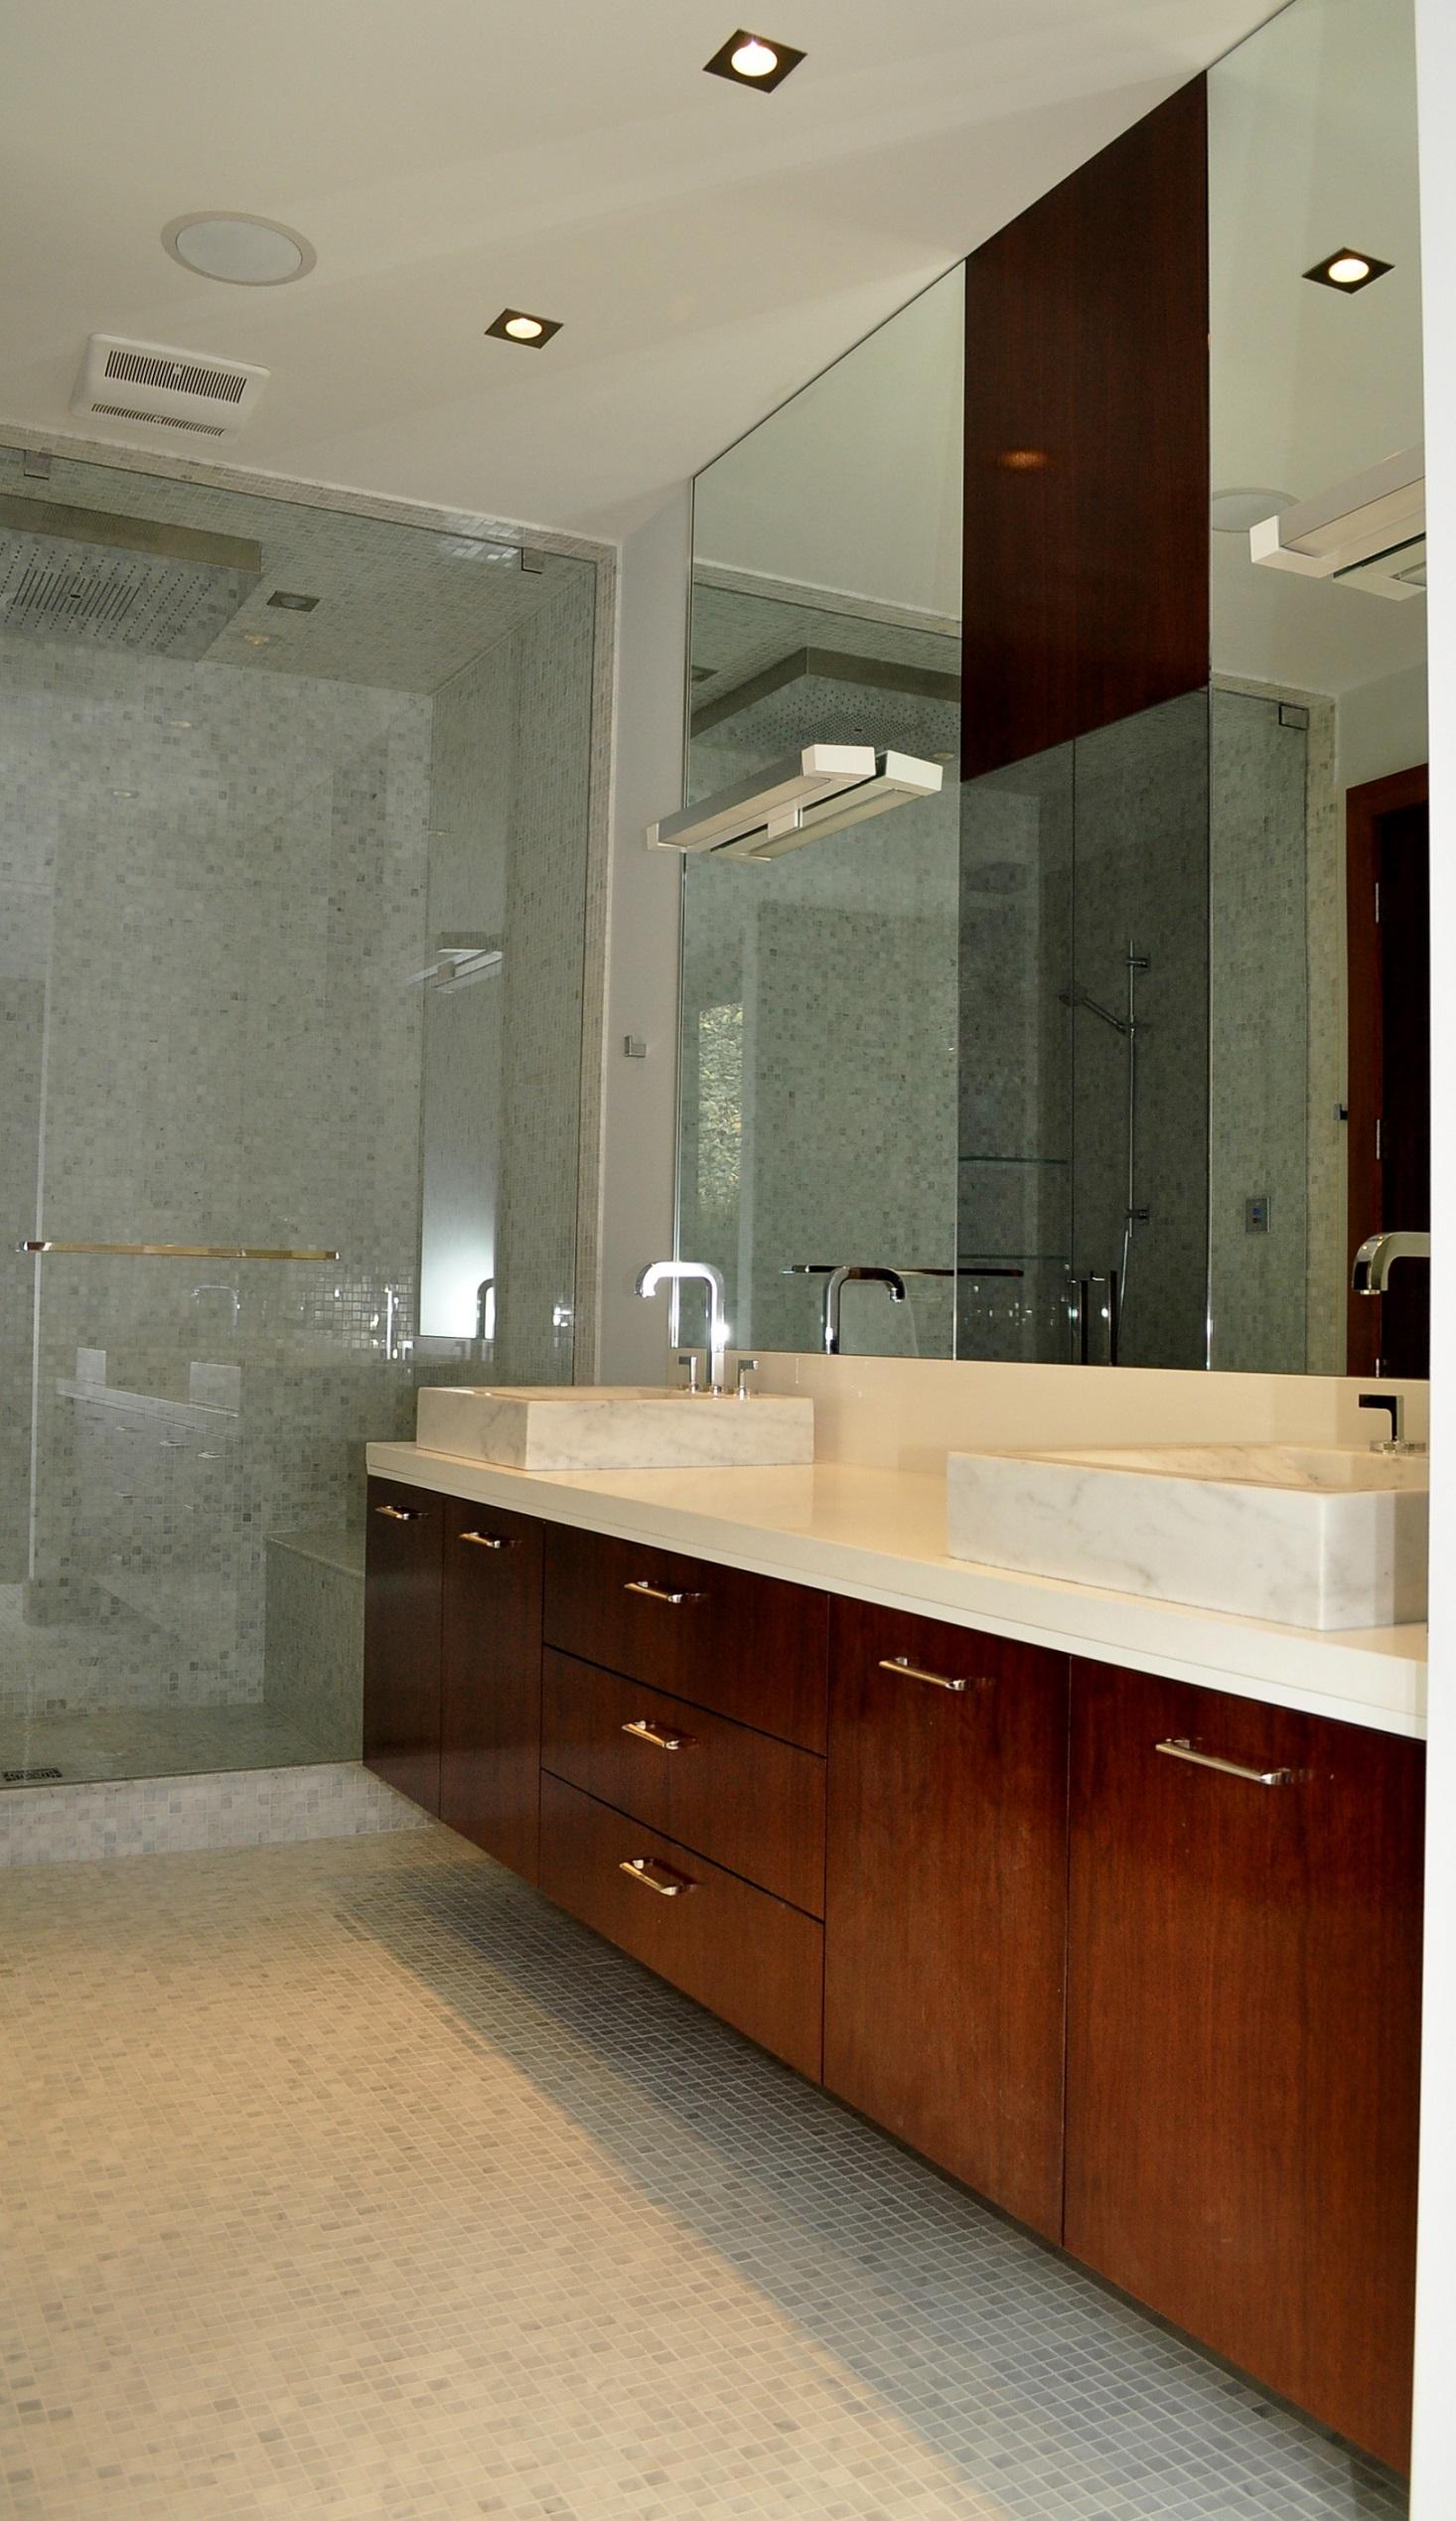 mahogany-wood-custom-floating-modern-bath-vanity-millwork.jpg.JPG